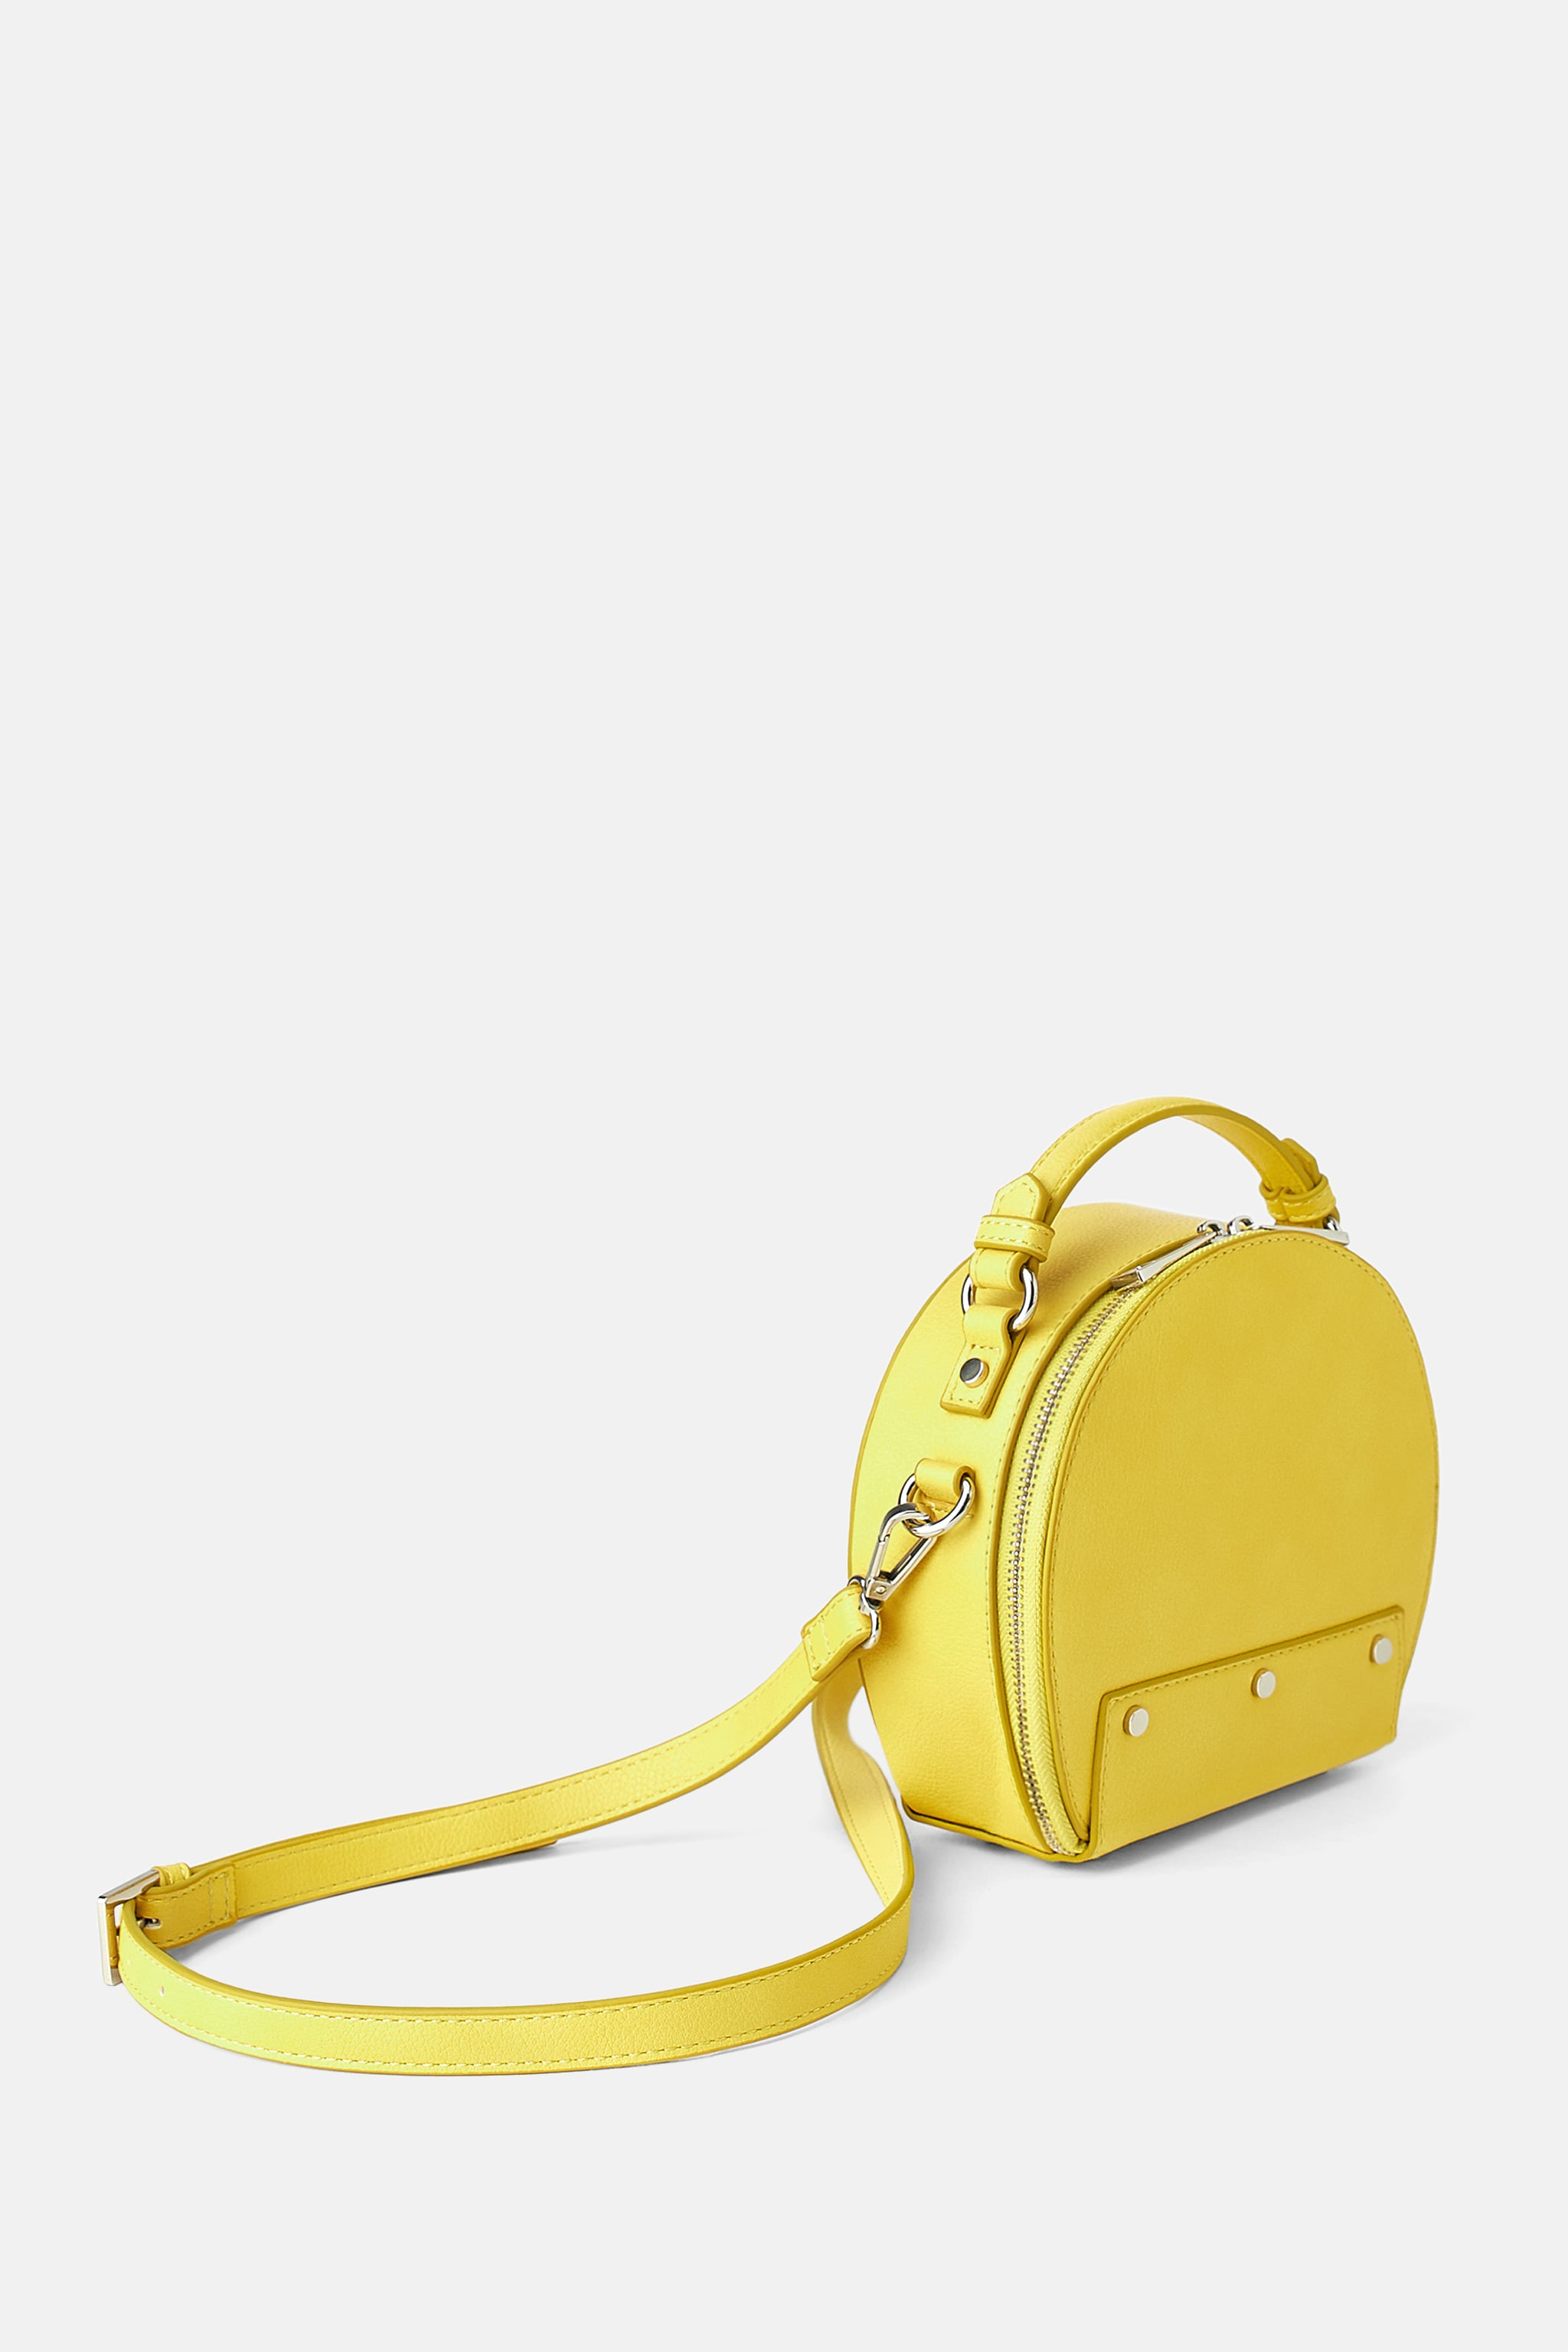 be79b8bed6 Zara ROUND CROSSBODY BAG